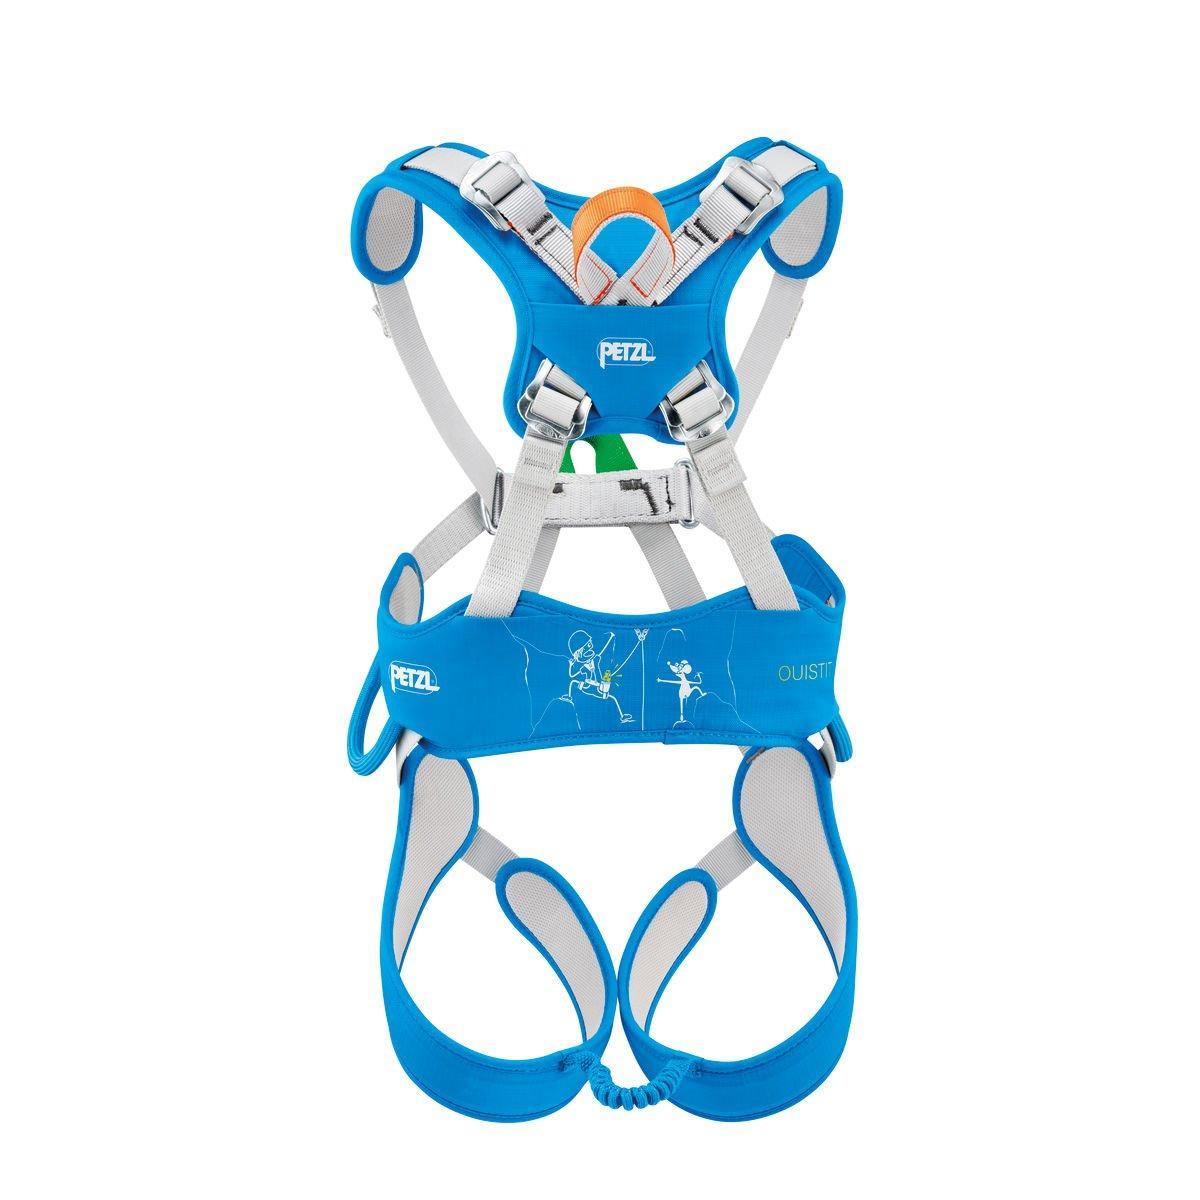 Petzl Charlet Petzl Charlt Ouistiti Childs Climbing Harness